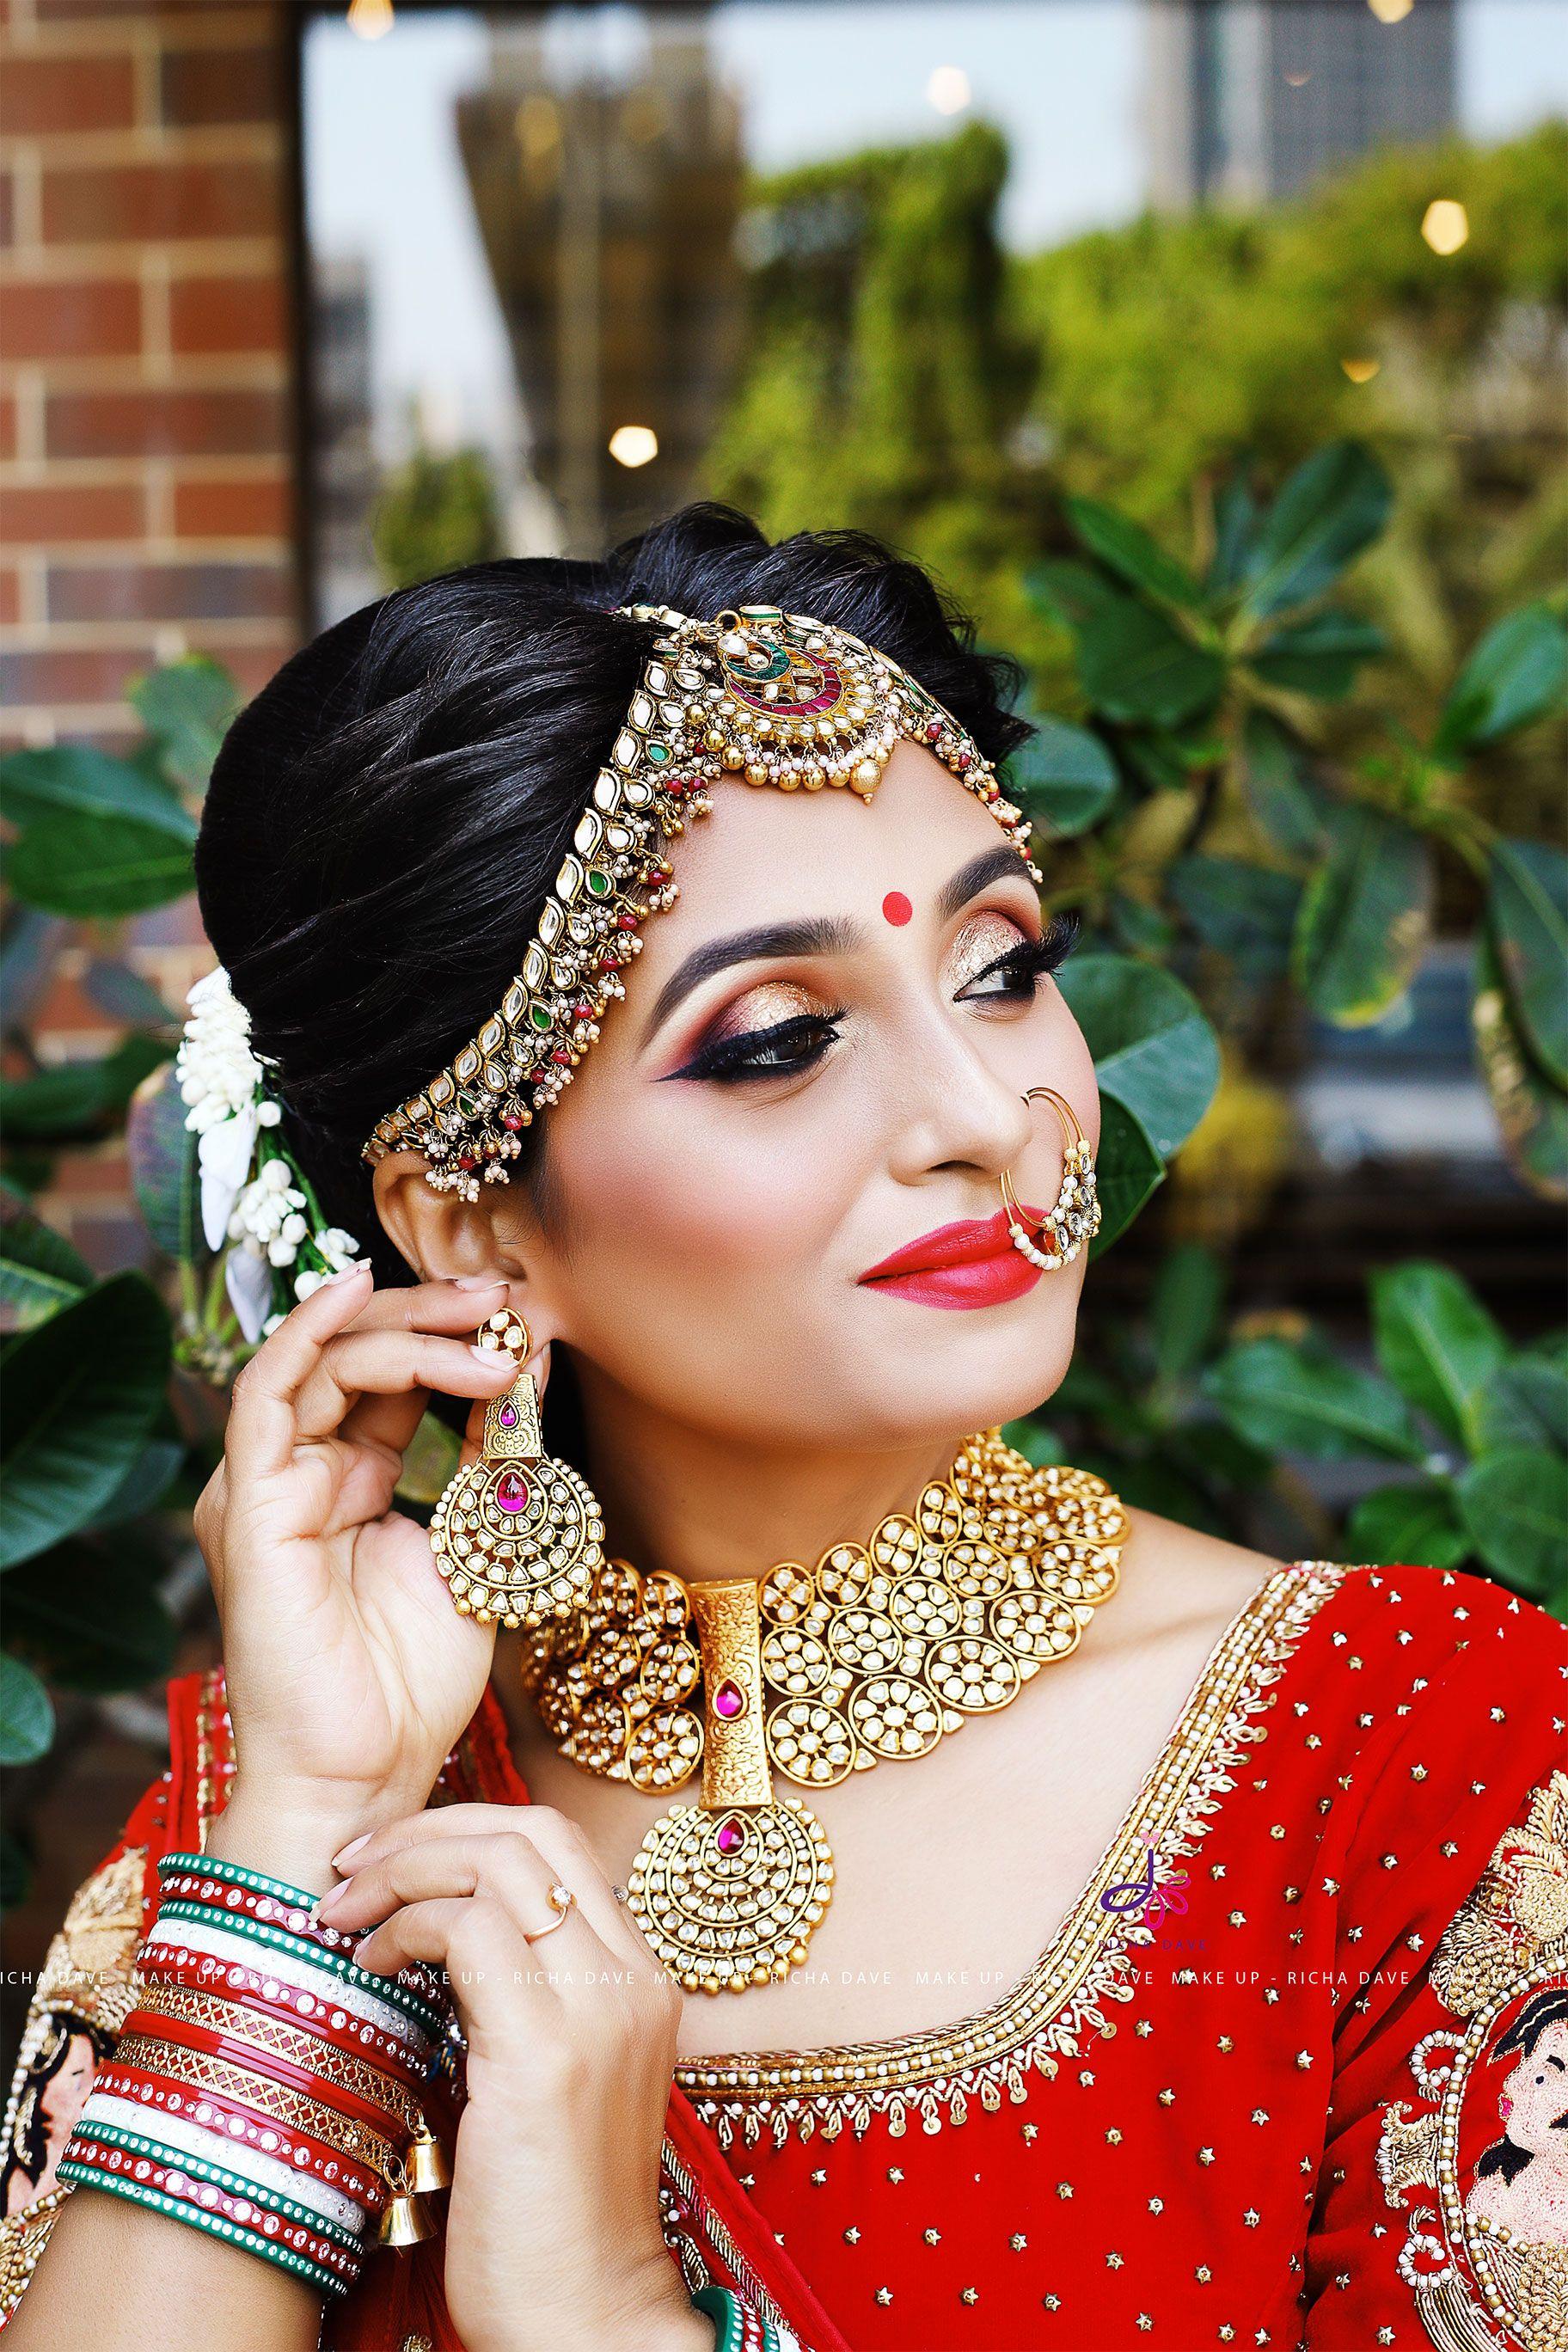 Another Glimpse Of Bride Model At Mumbai Seminar And Workshop Mumbai Makeup Richa Dave Hairs Indian Bridal Hairstyles Indian Bridal Makeup Bridal Makeover